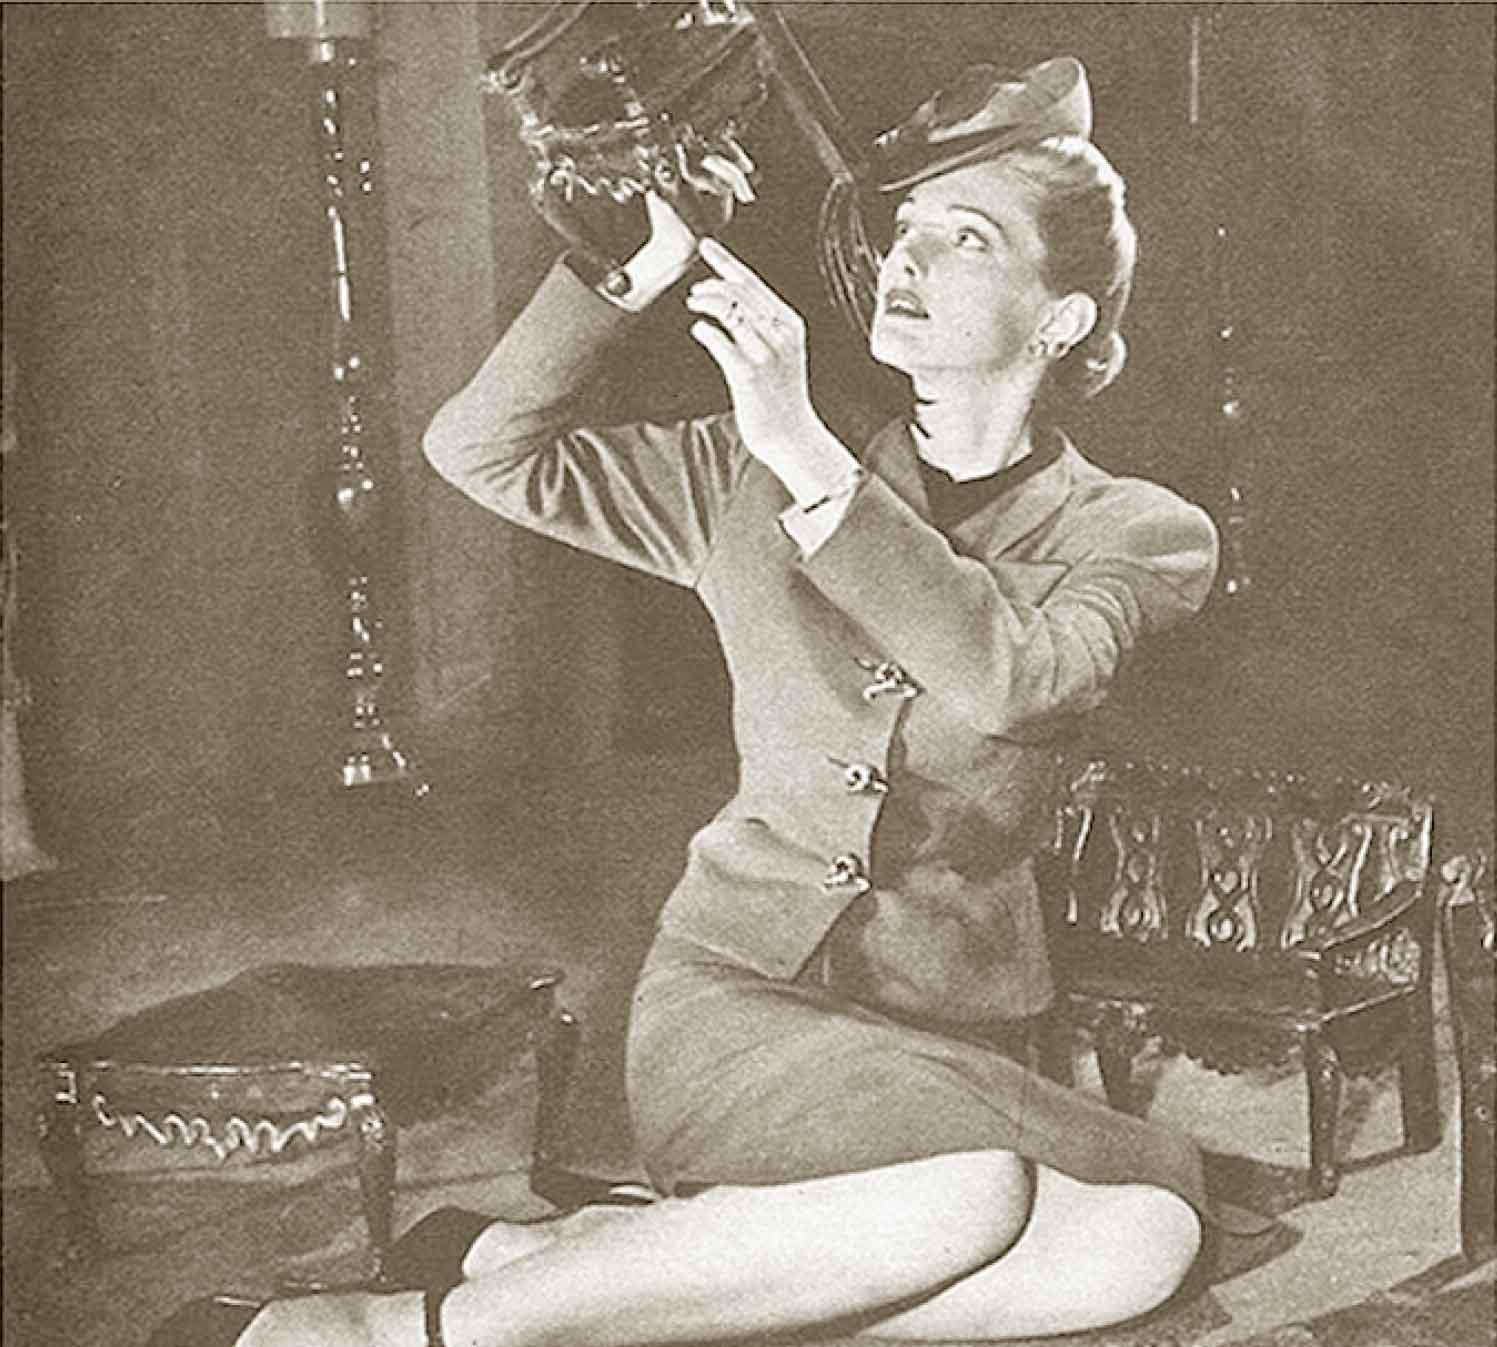 1940s-fashion---Slim-Wartime-Silhouette-